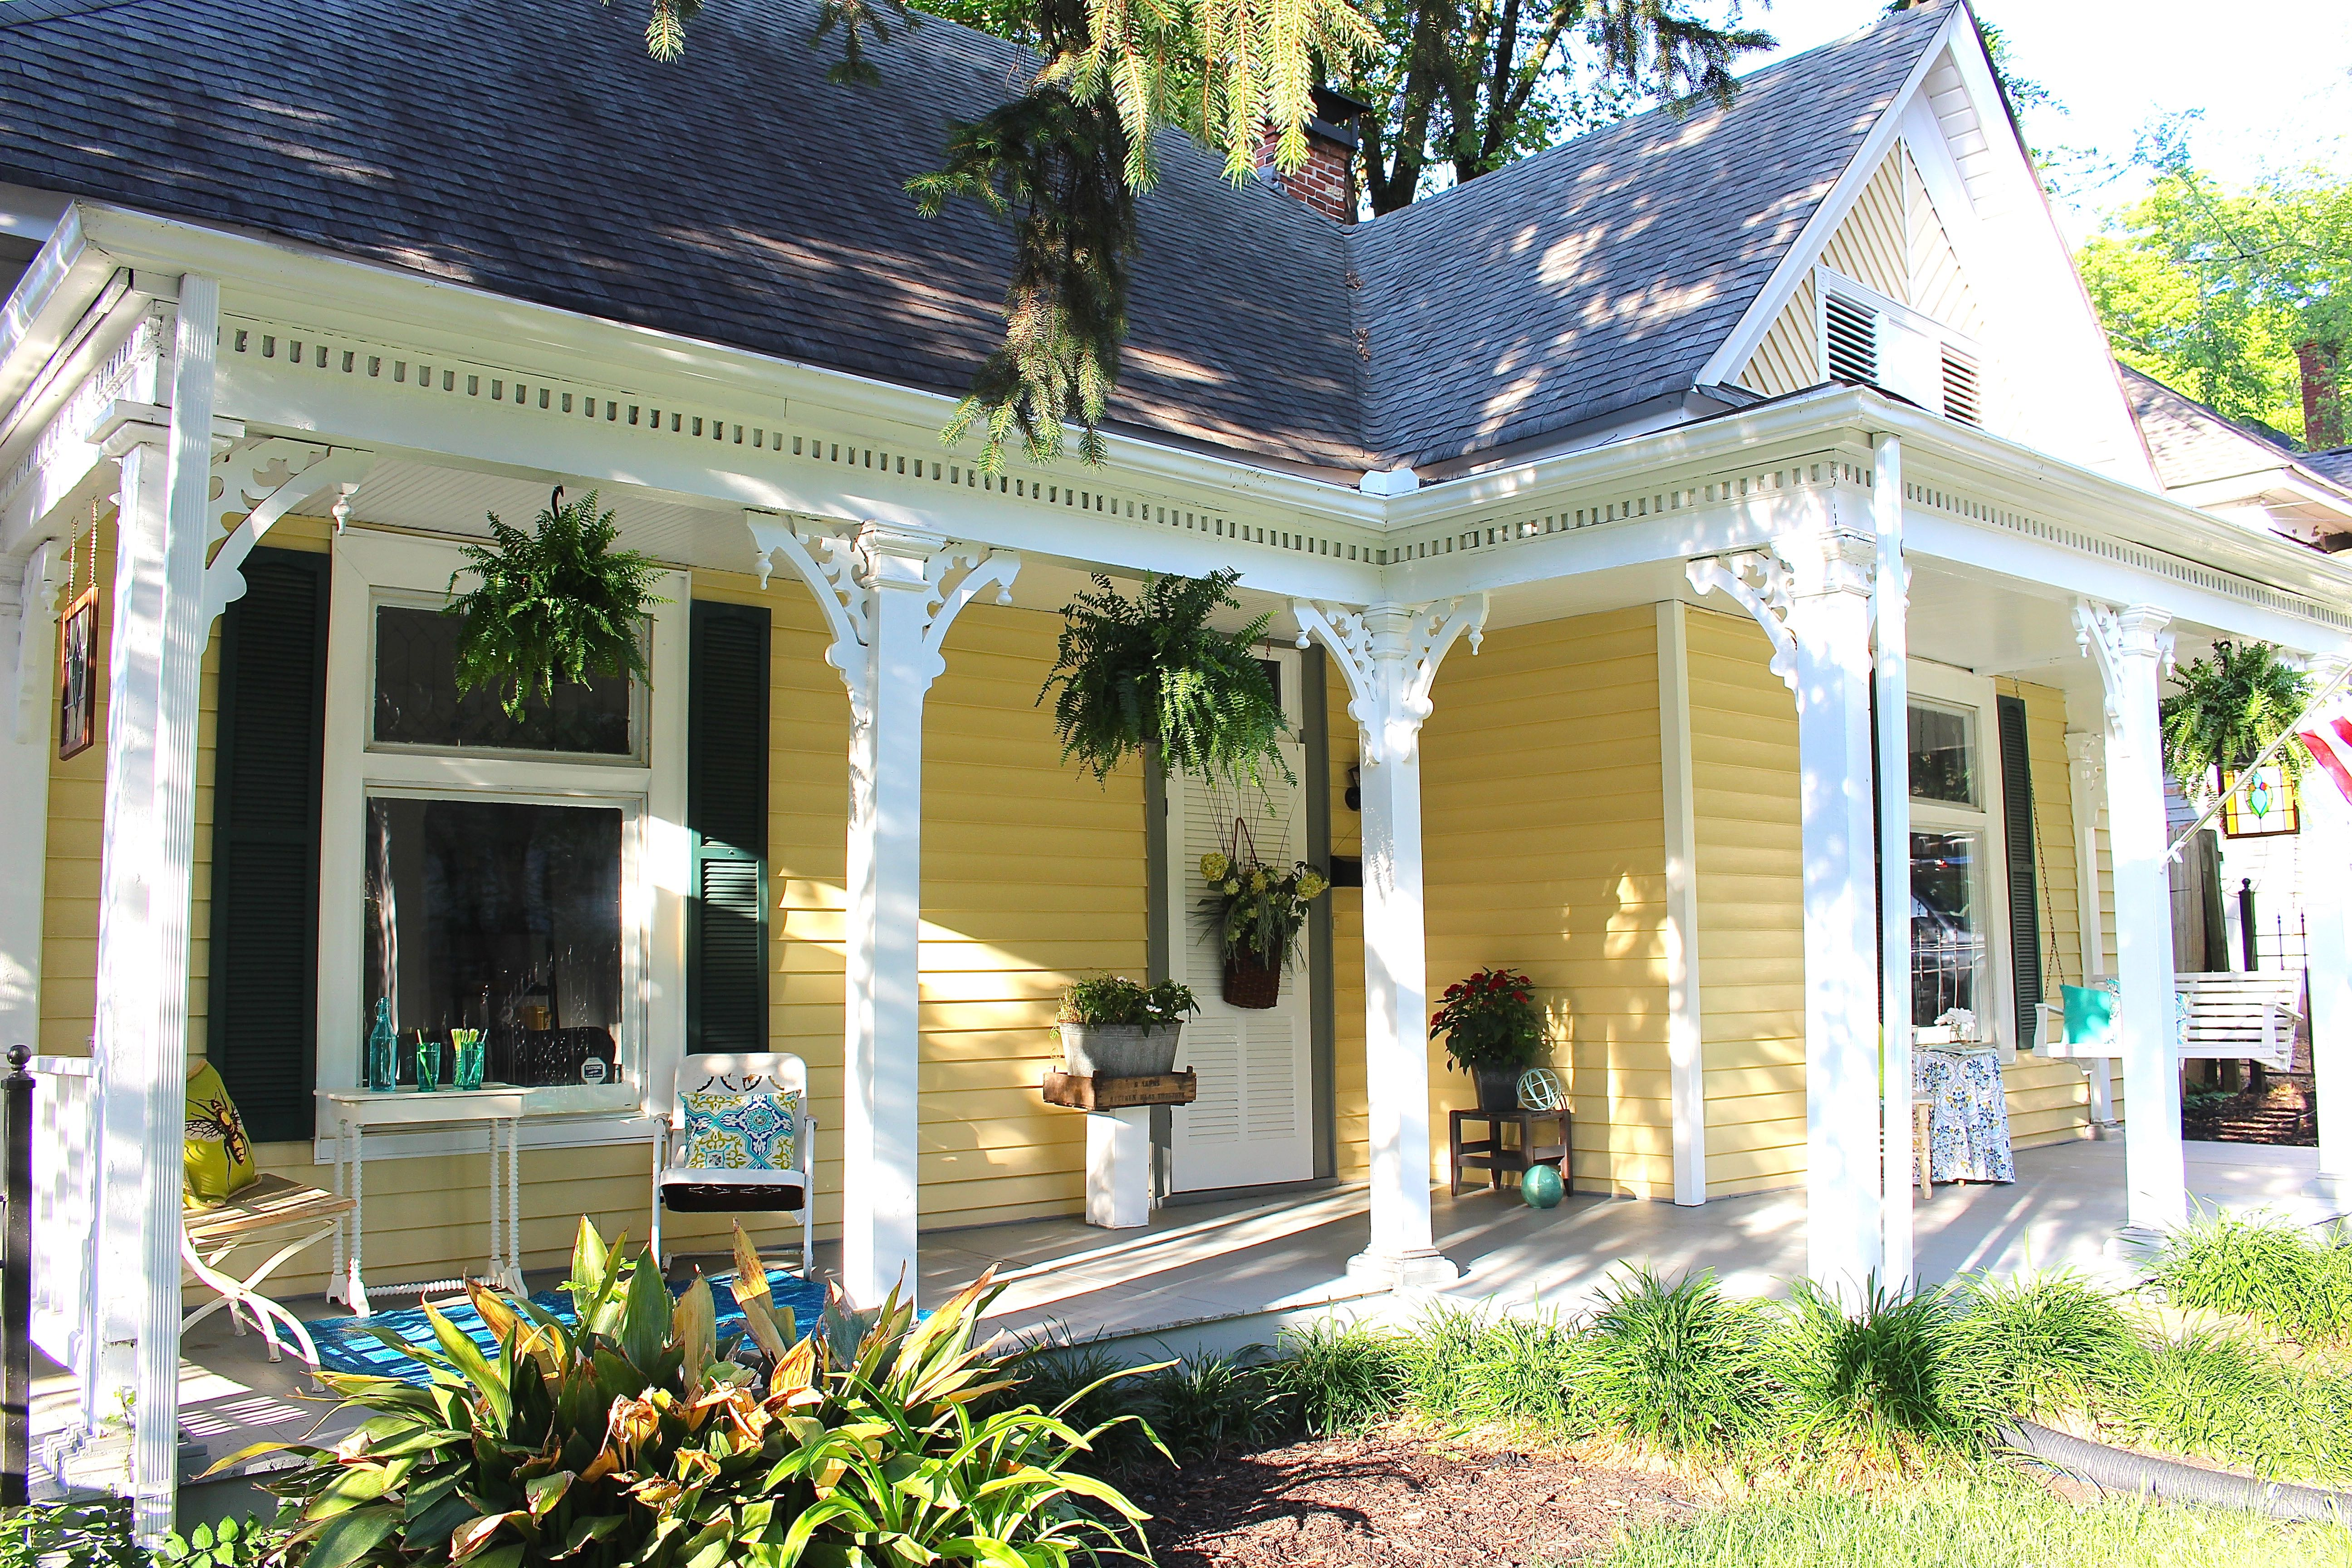 Jenn's front Porch